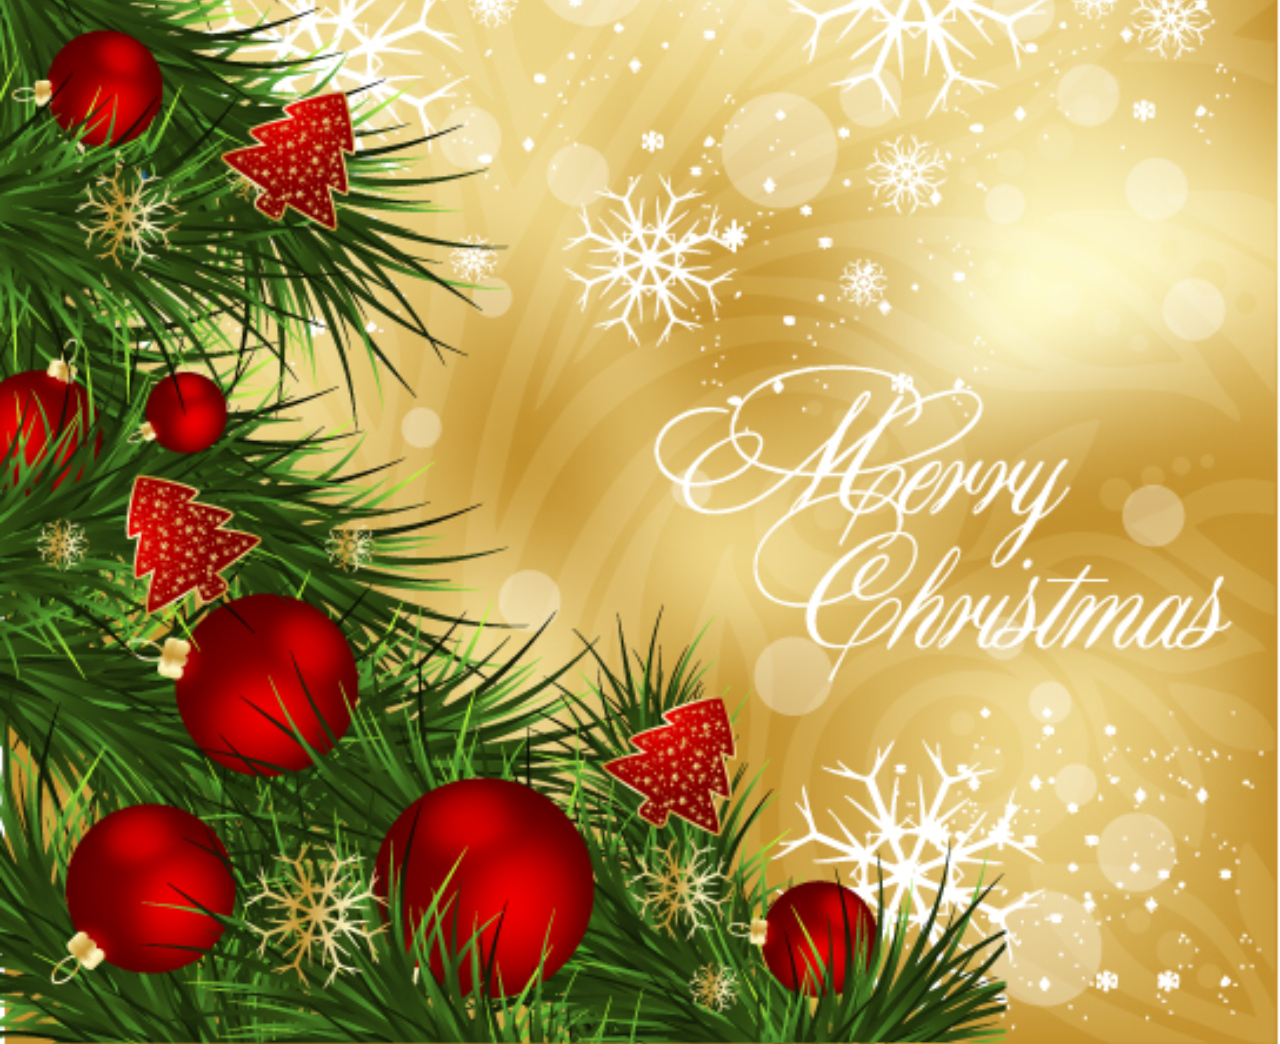 Merry Christmas jpg